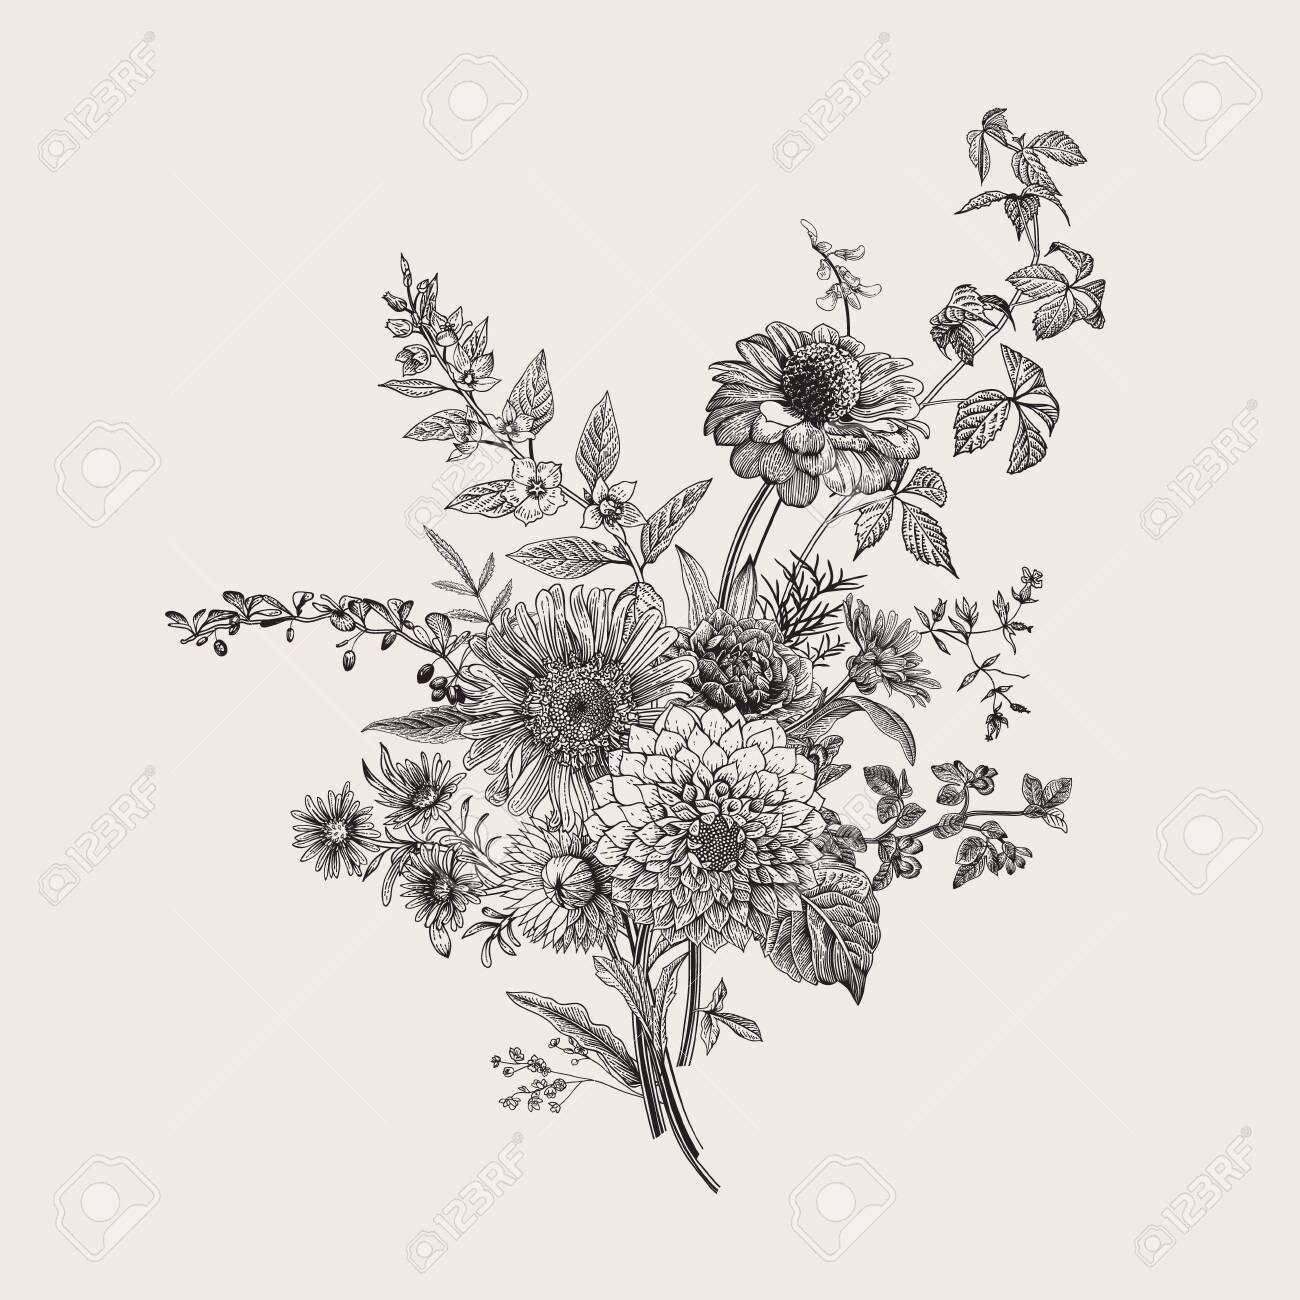 Autumn Flowers Classic Flower Arrangement Vector Botanical Royalty Free Cliparts Vectors And Stock Illustration Image 133951631